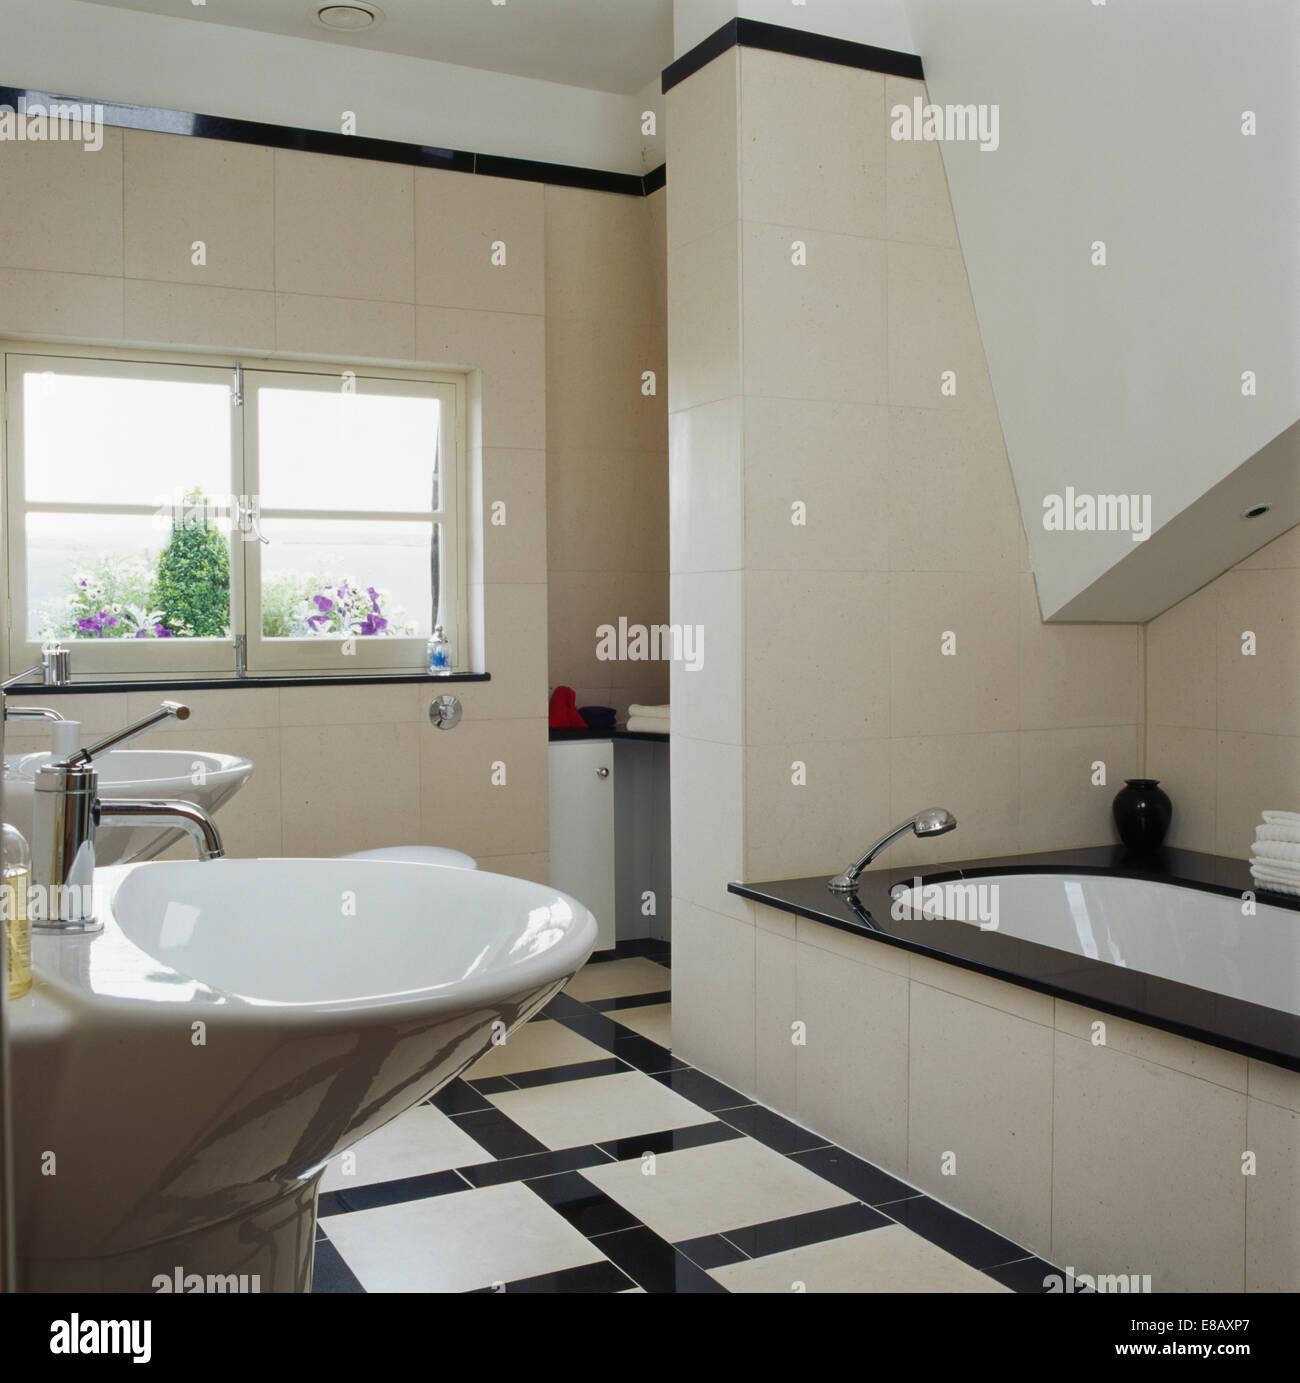 Black And White Tiled Floor Stock Photos & Black And White Tiled ...